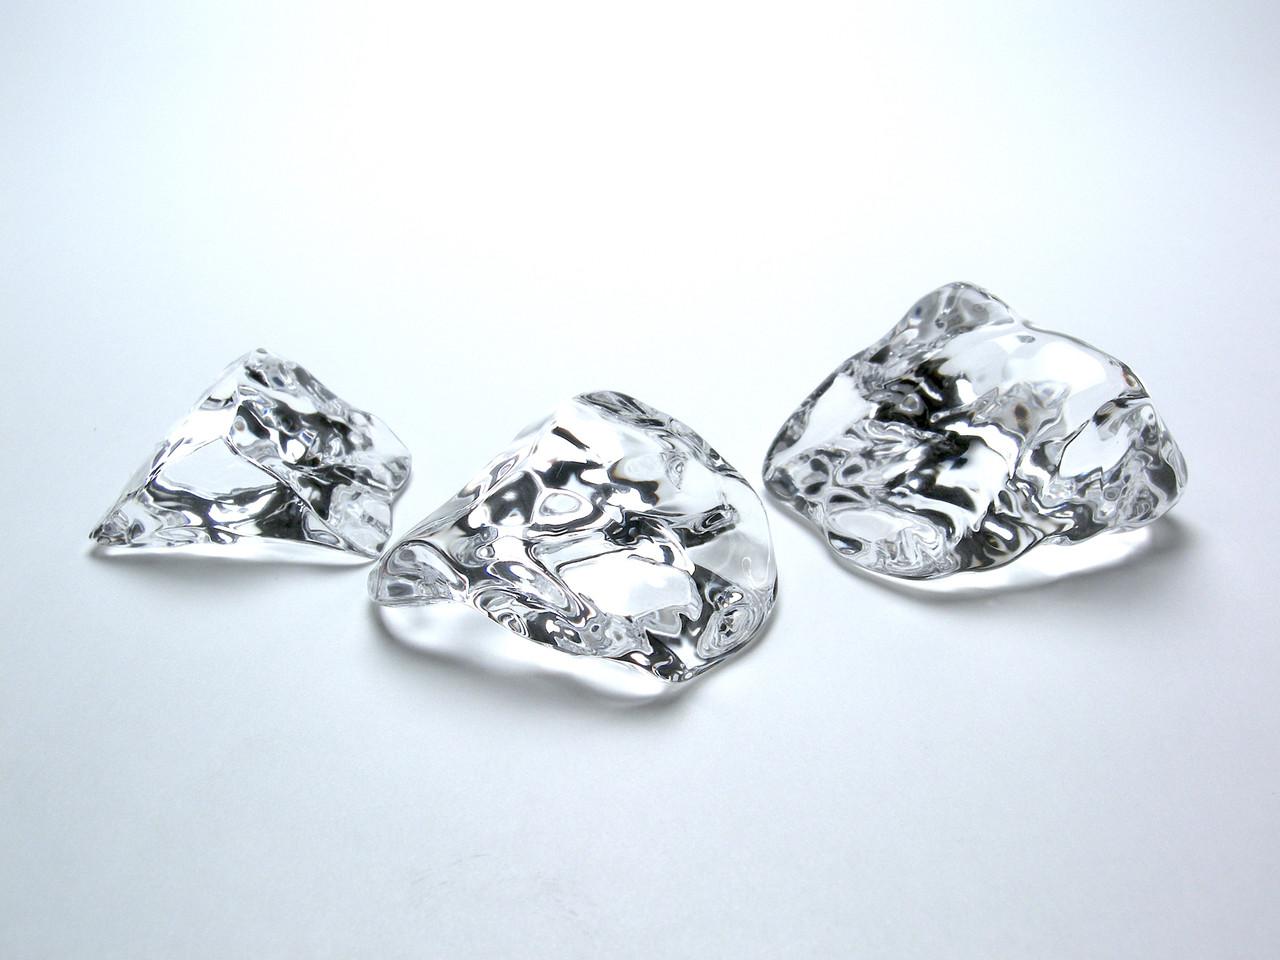 TRENGOVE Wedge Ice - Small (1 Piece)